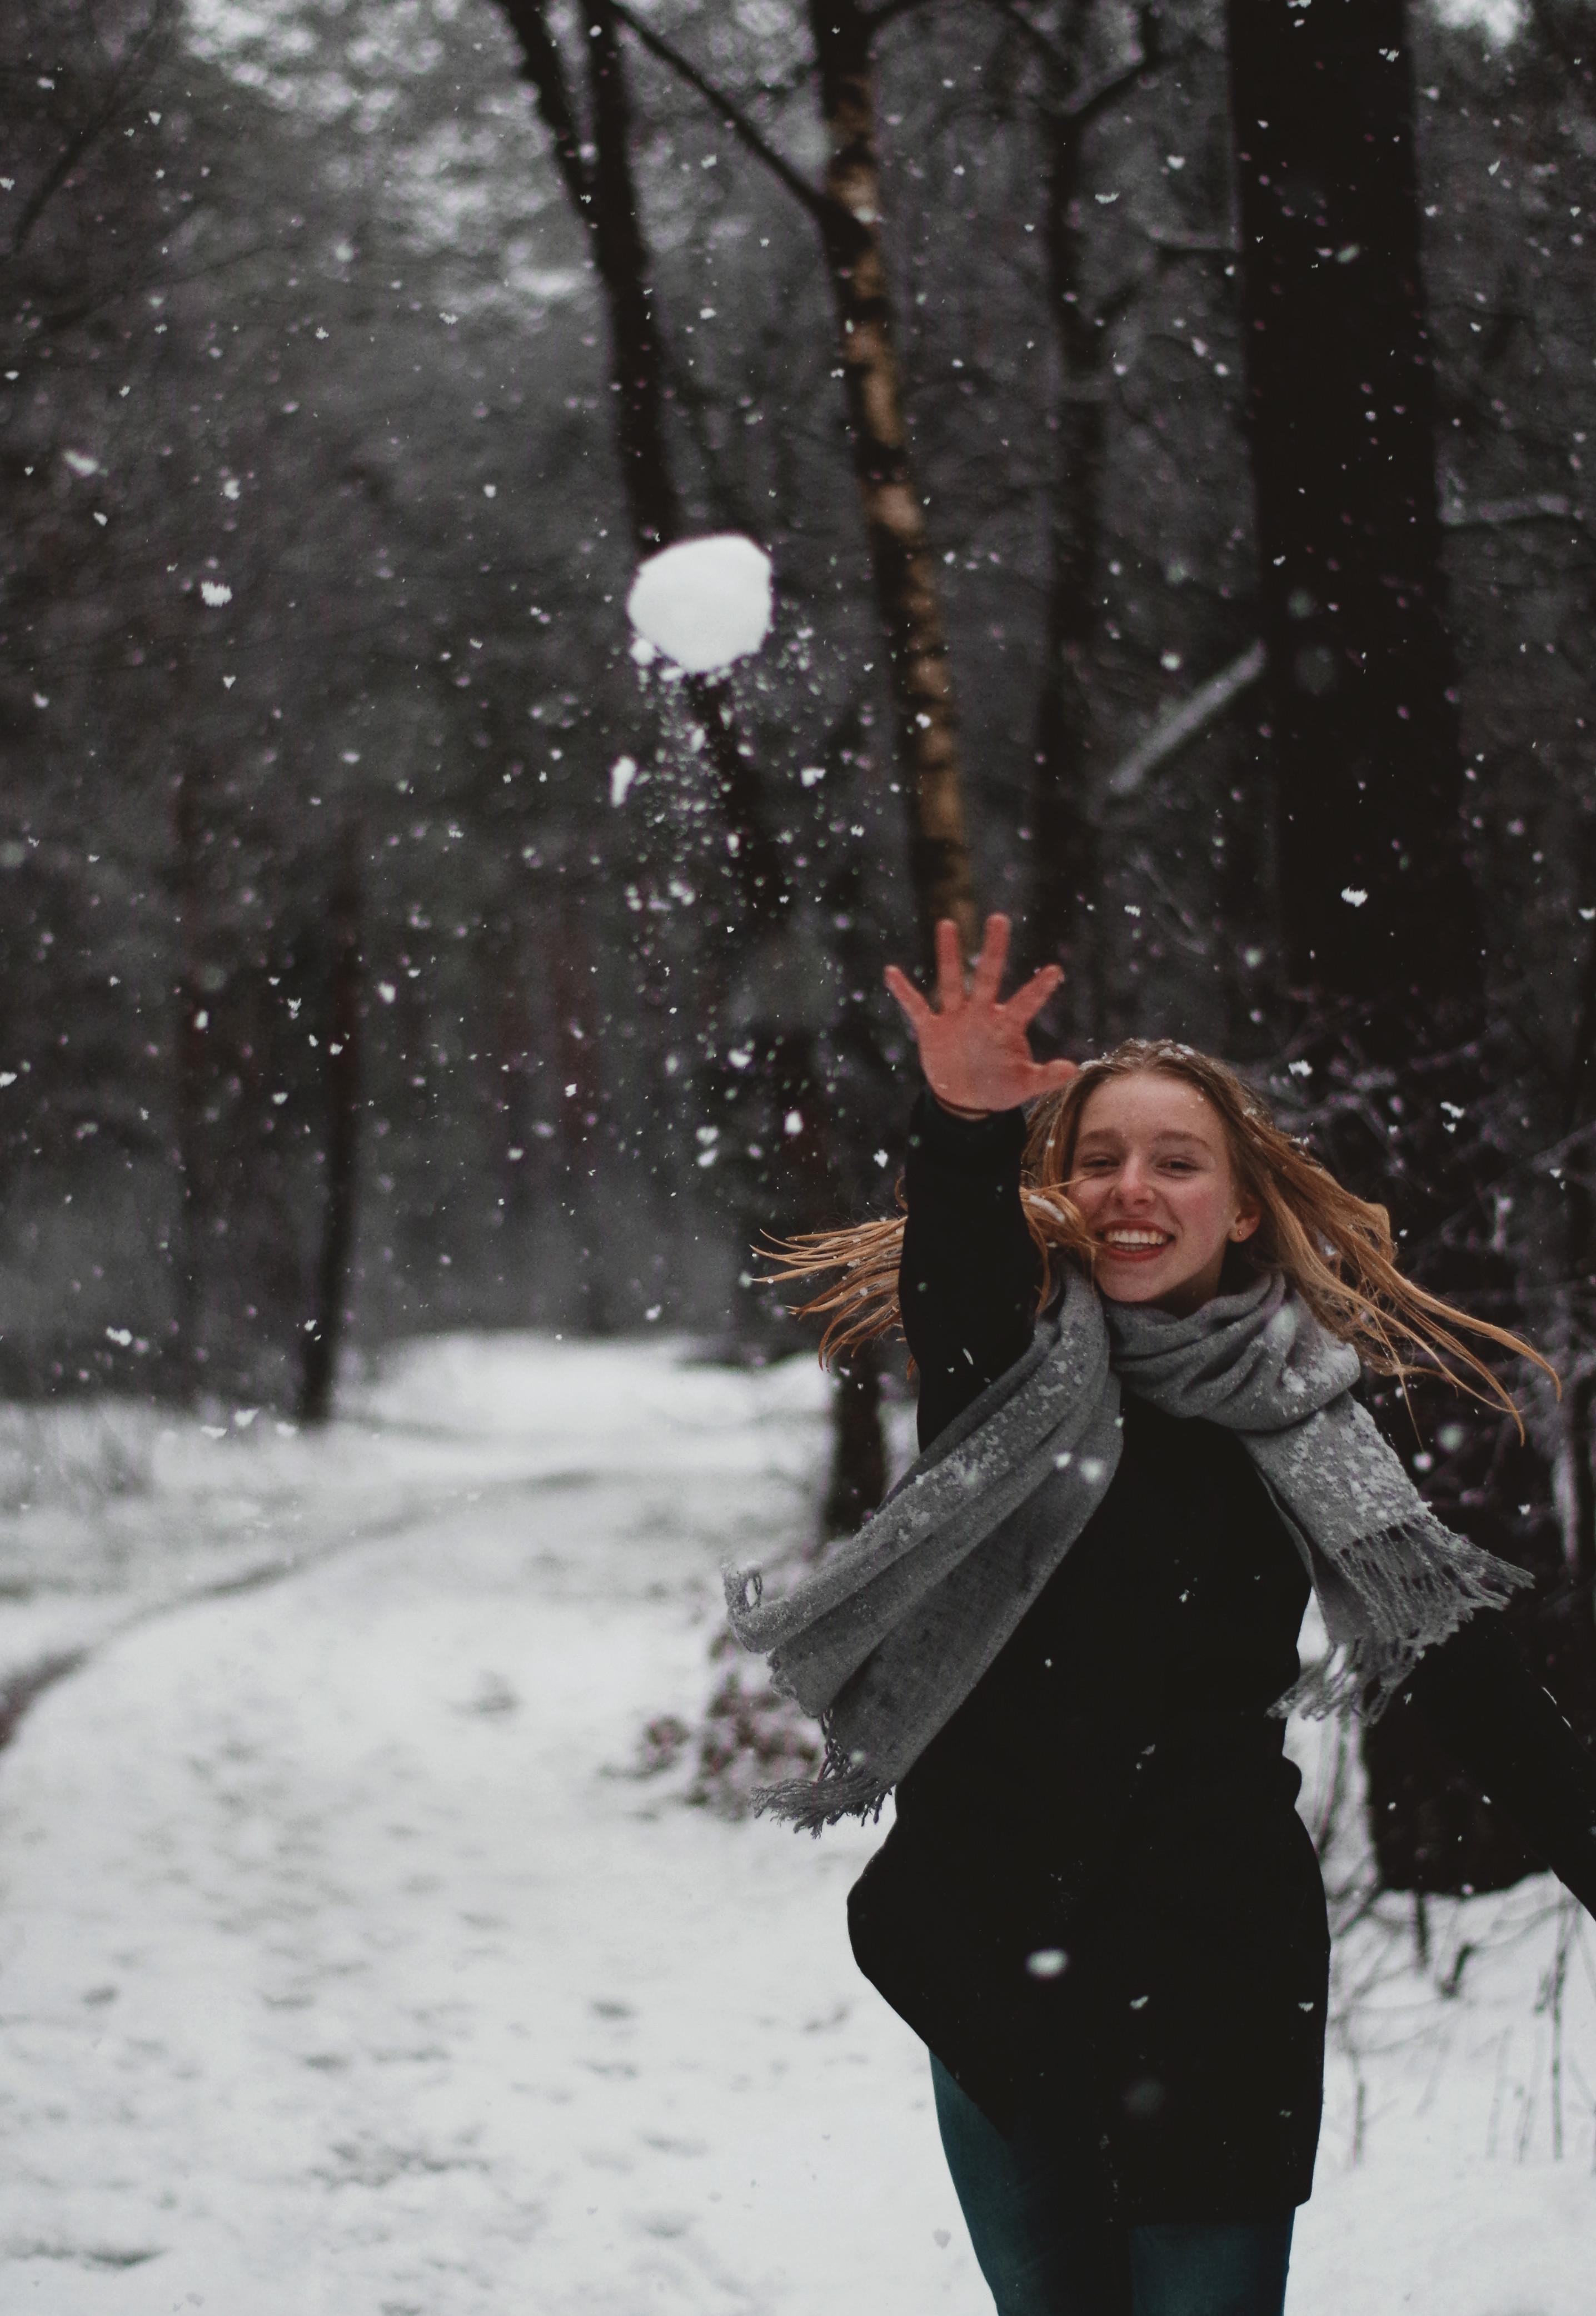 Snowbal fight